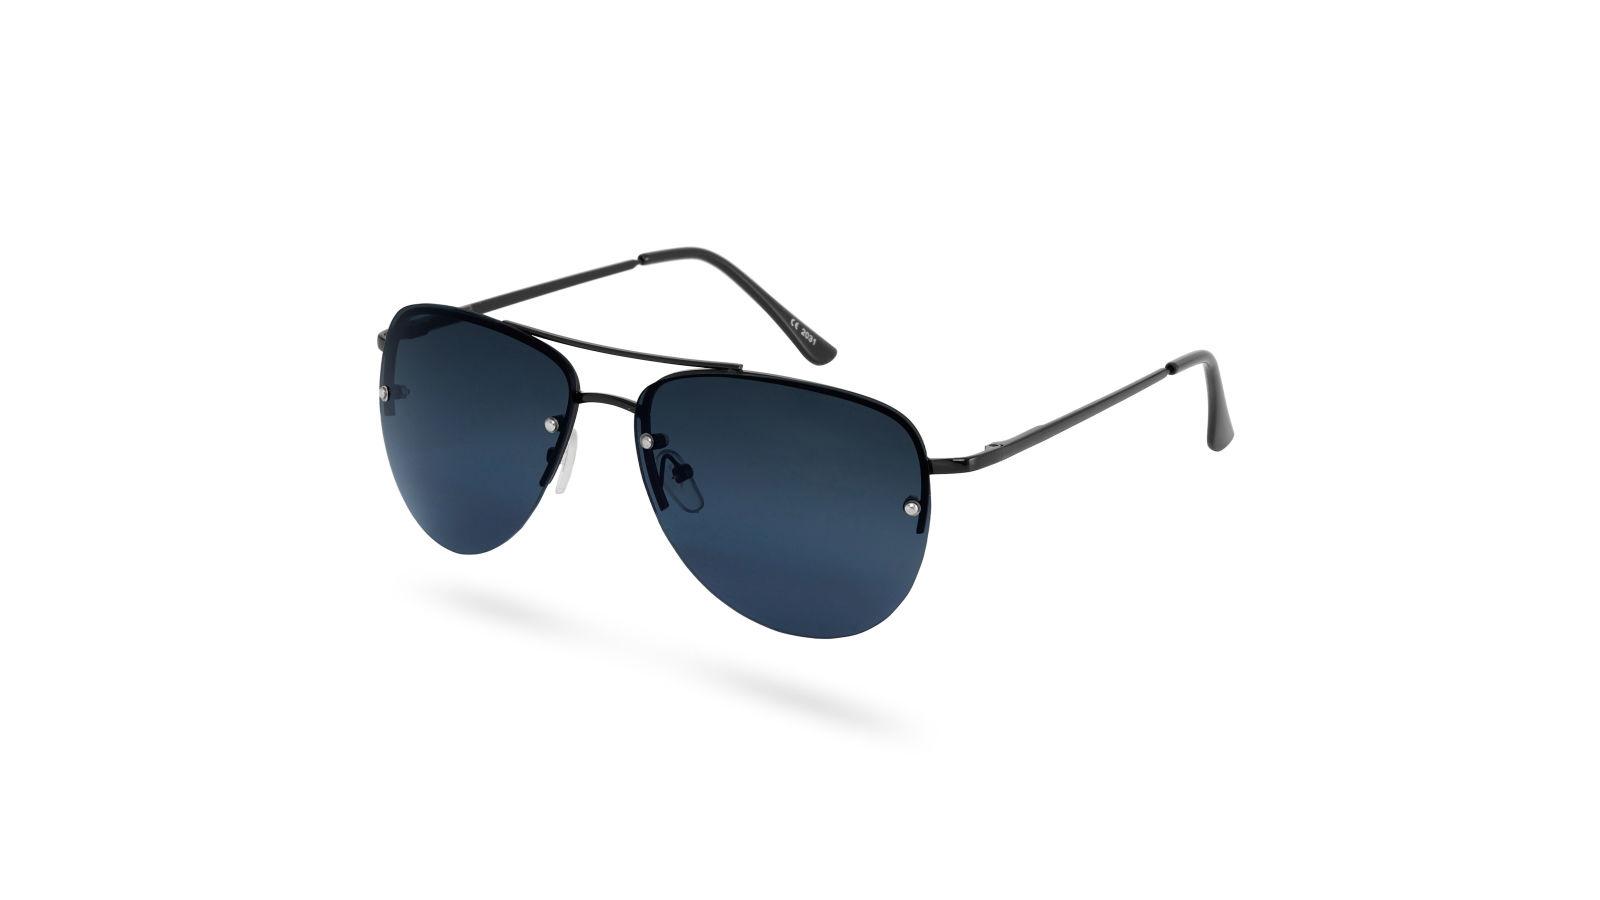 90fb306a56dd03 Volledig Zwarte Aviator Smoked Zonnebril